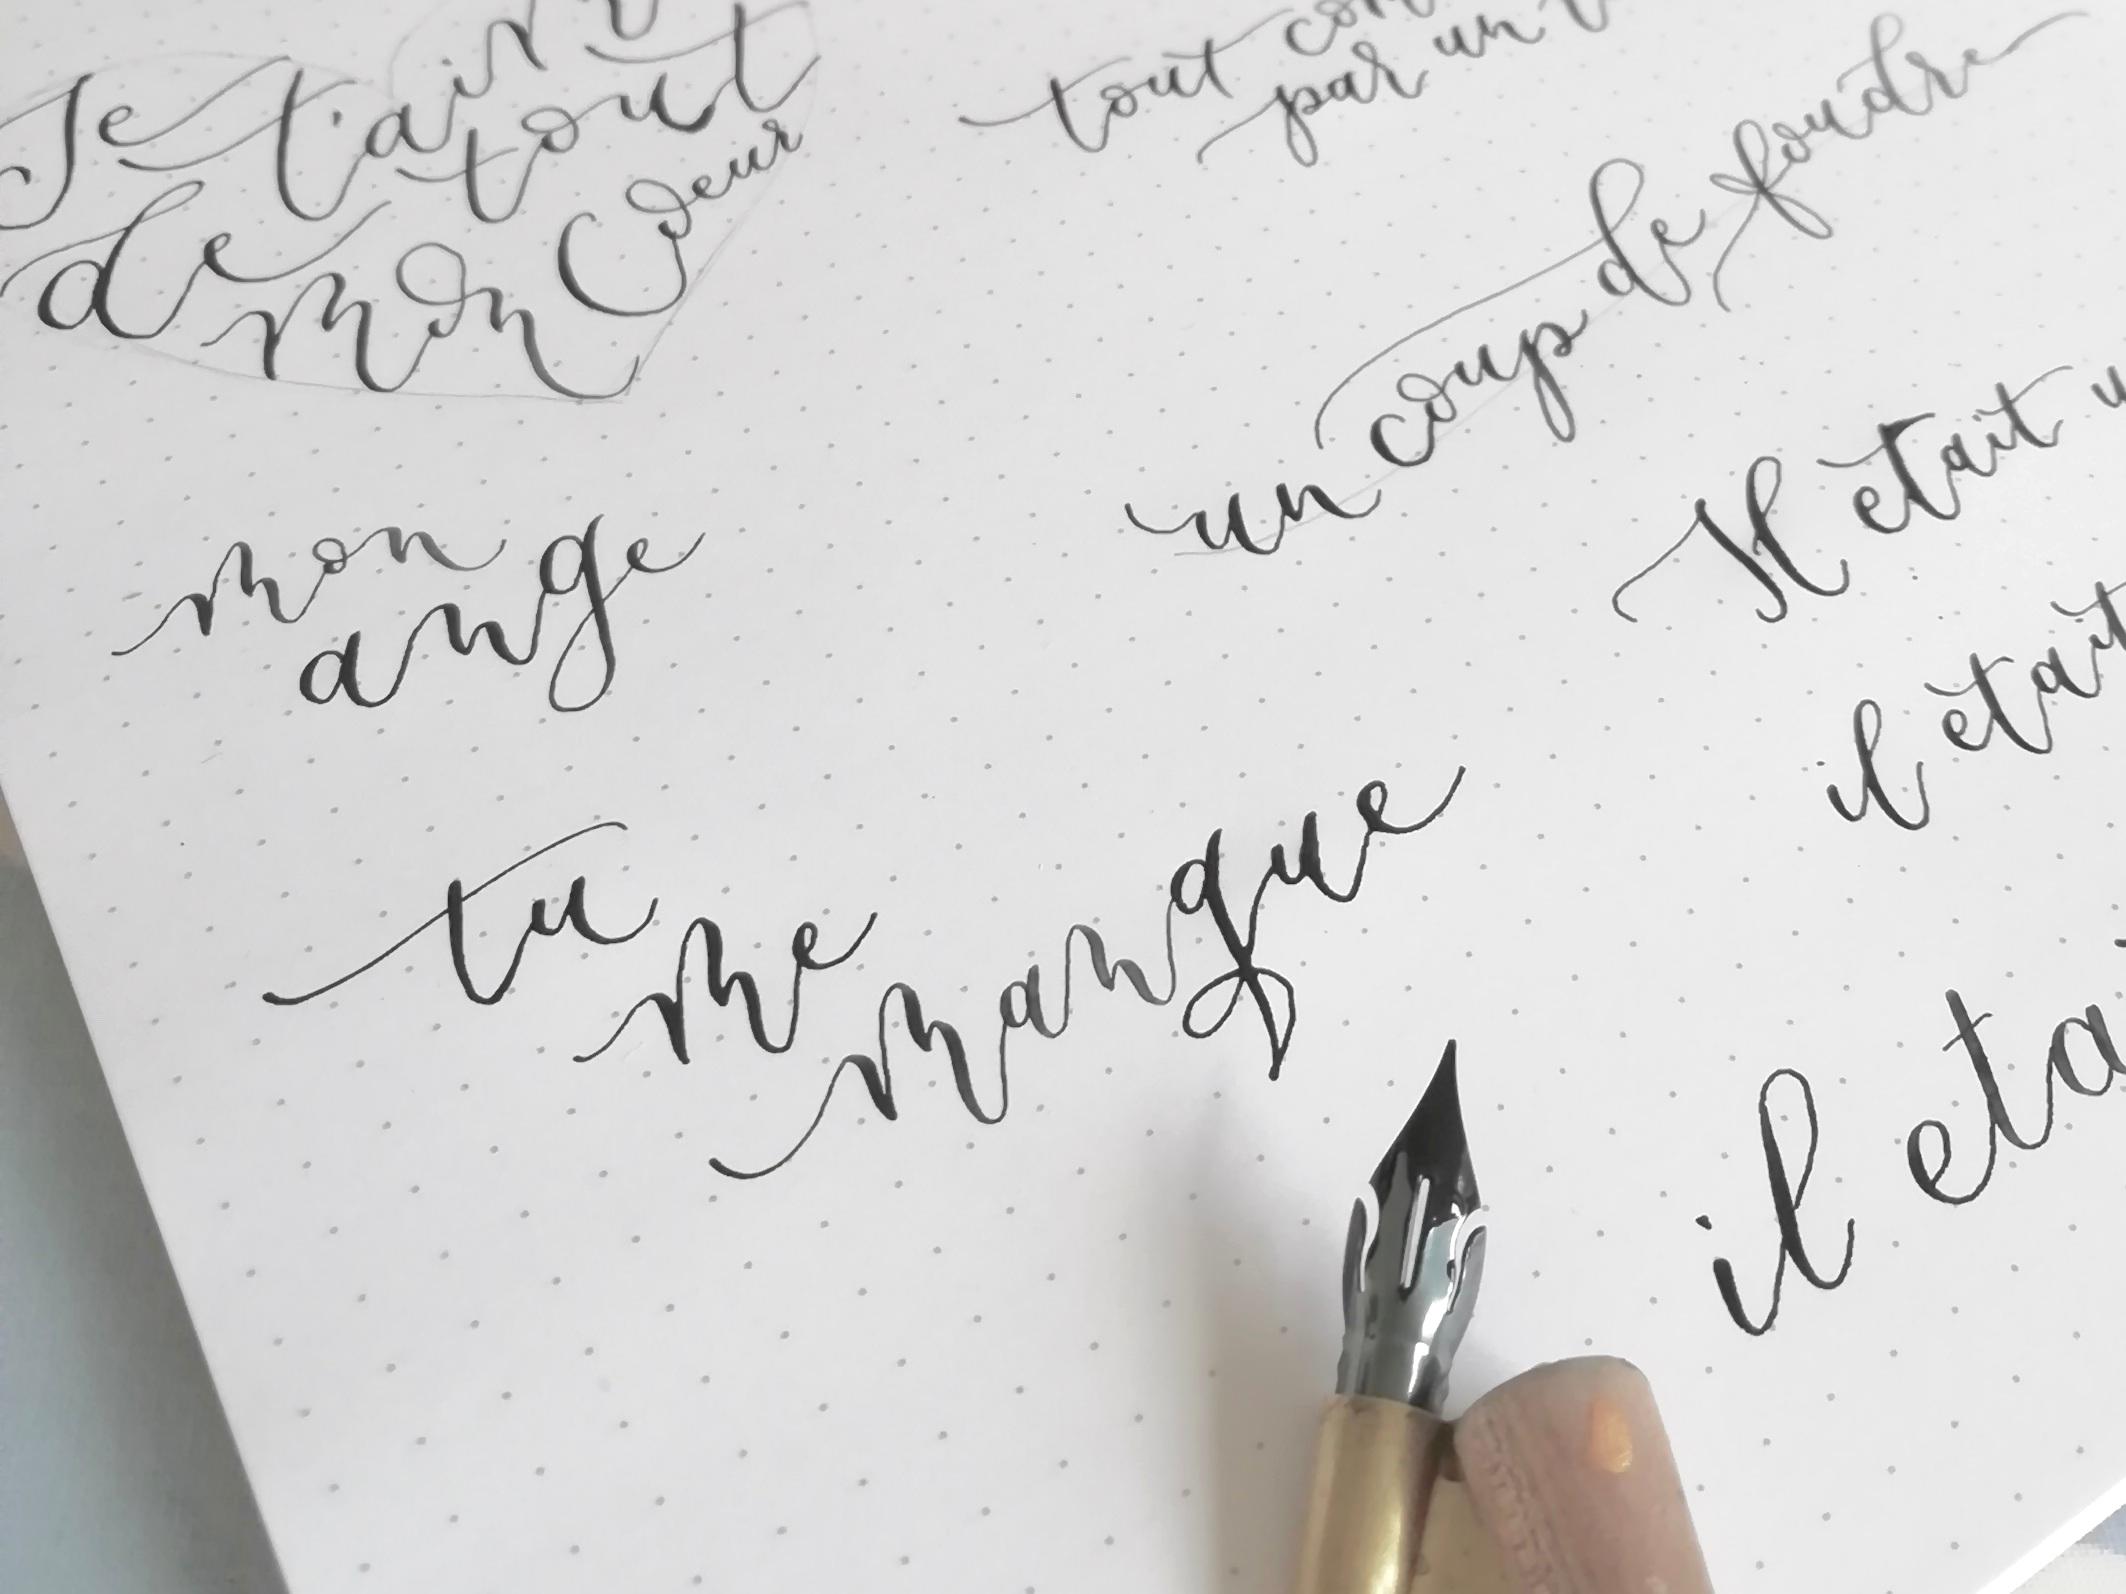 calligraphy practice for beginners